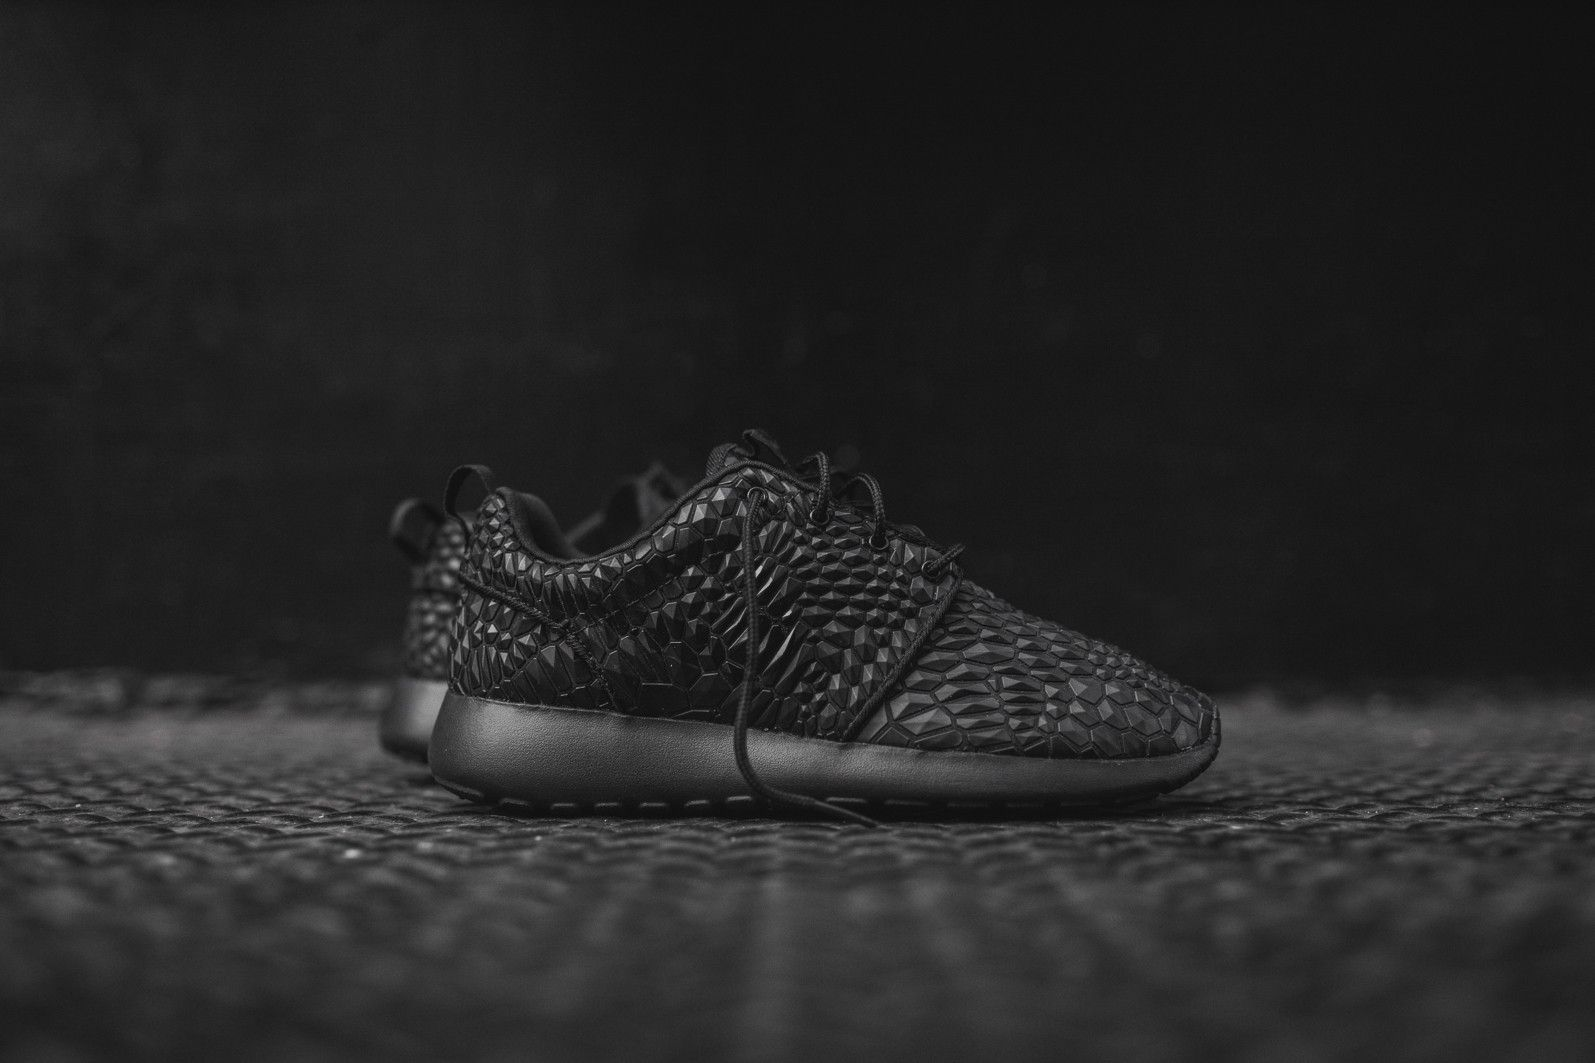 Nike WMNS Roshe One DMB - Triple Black